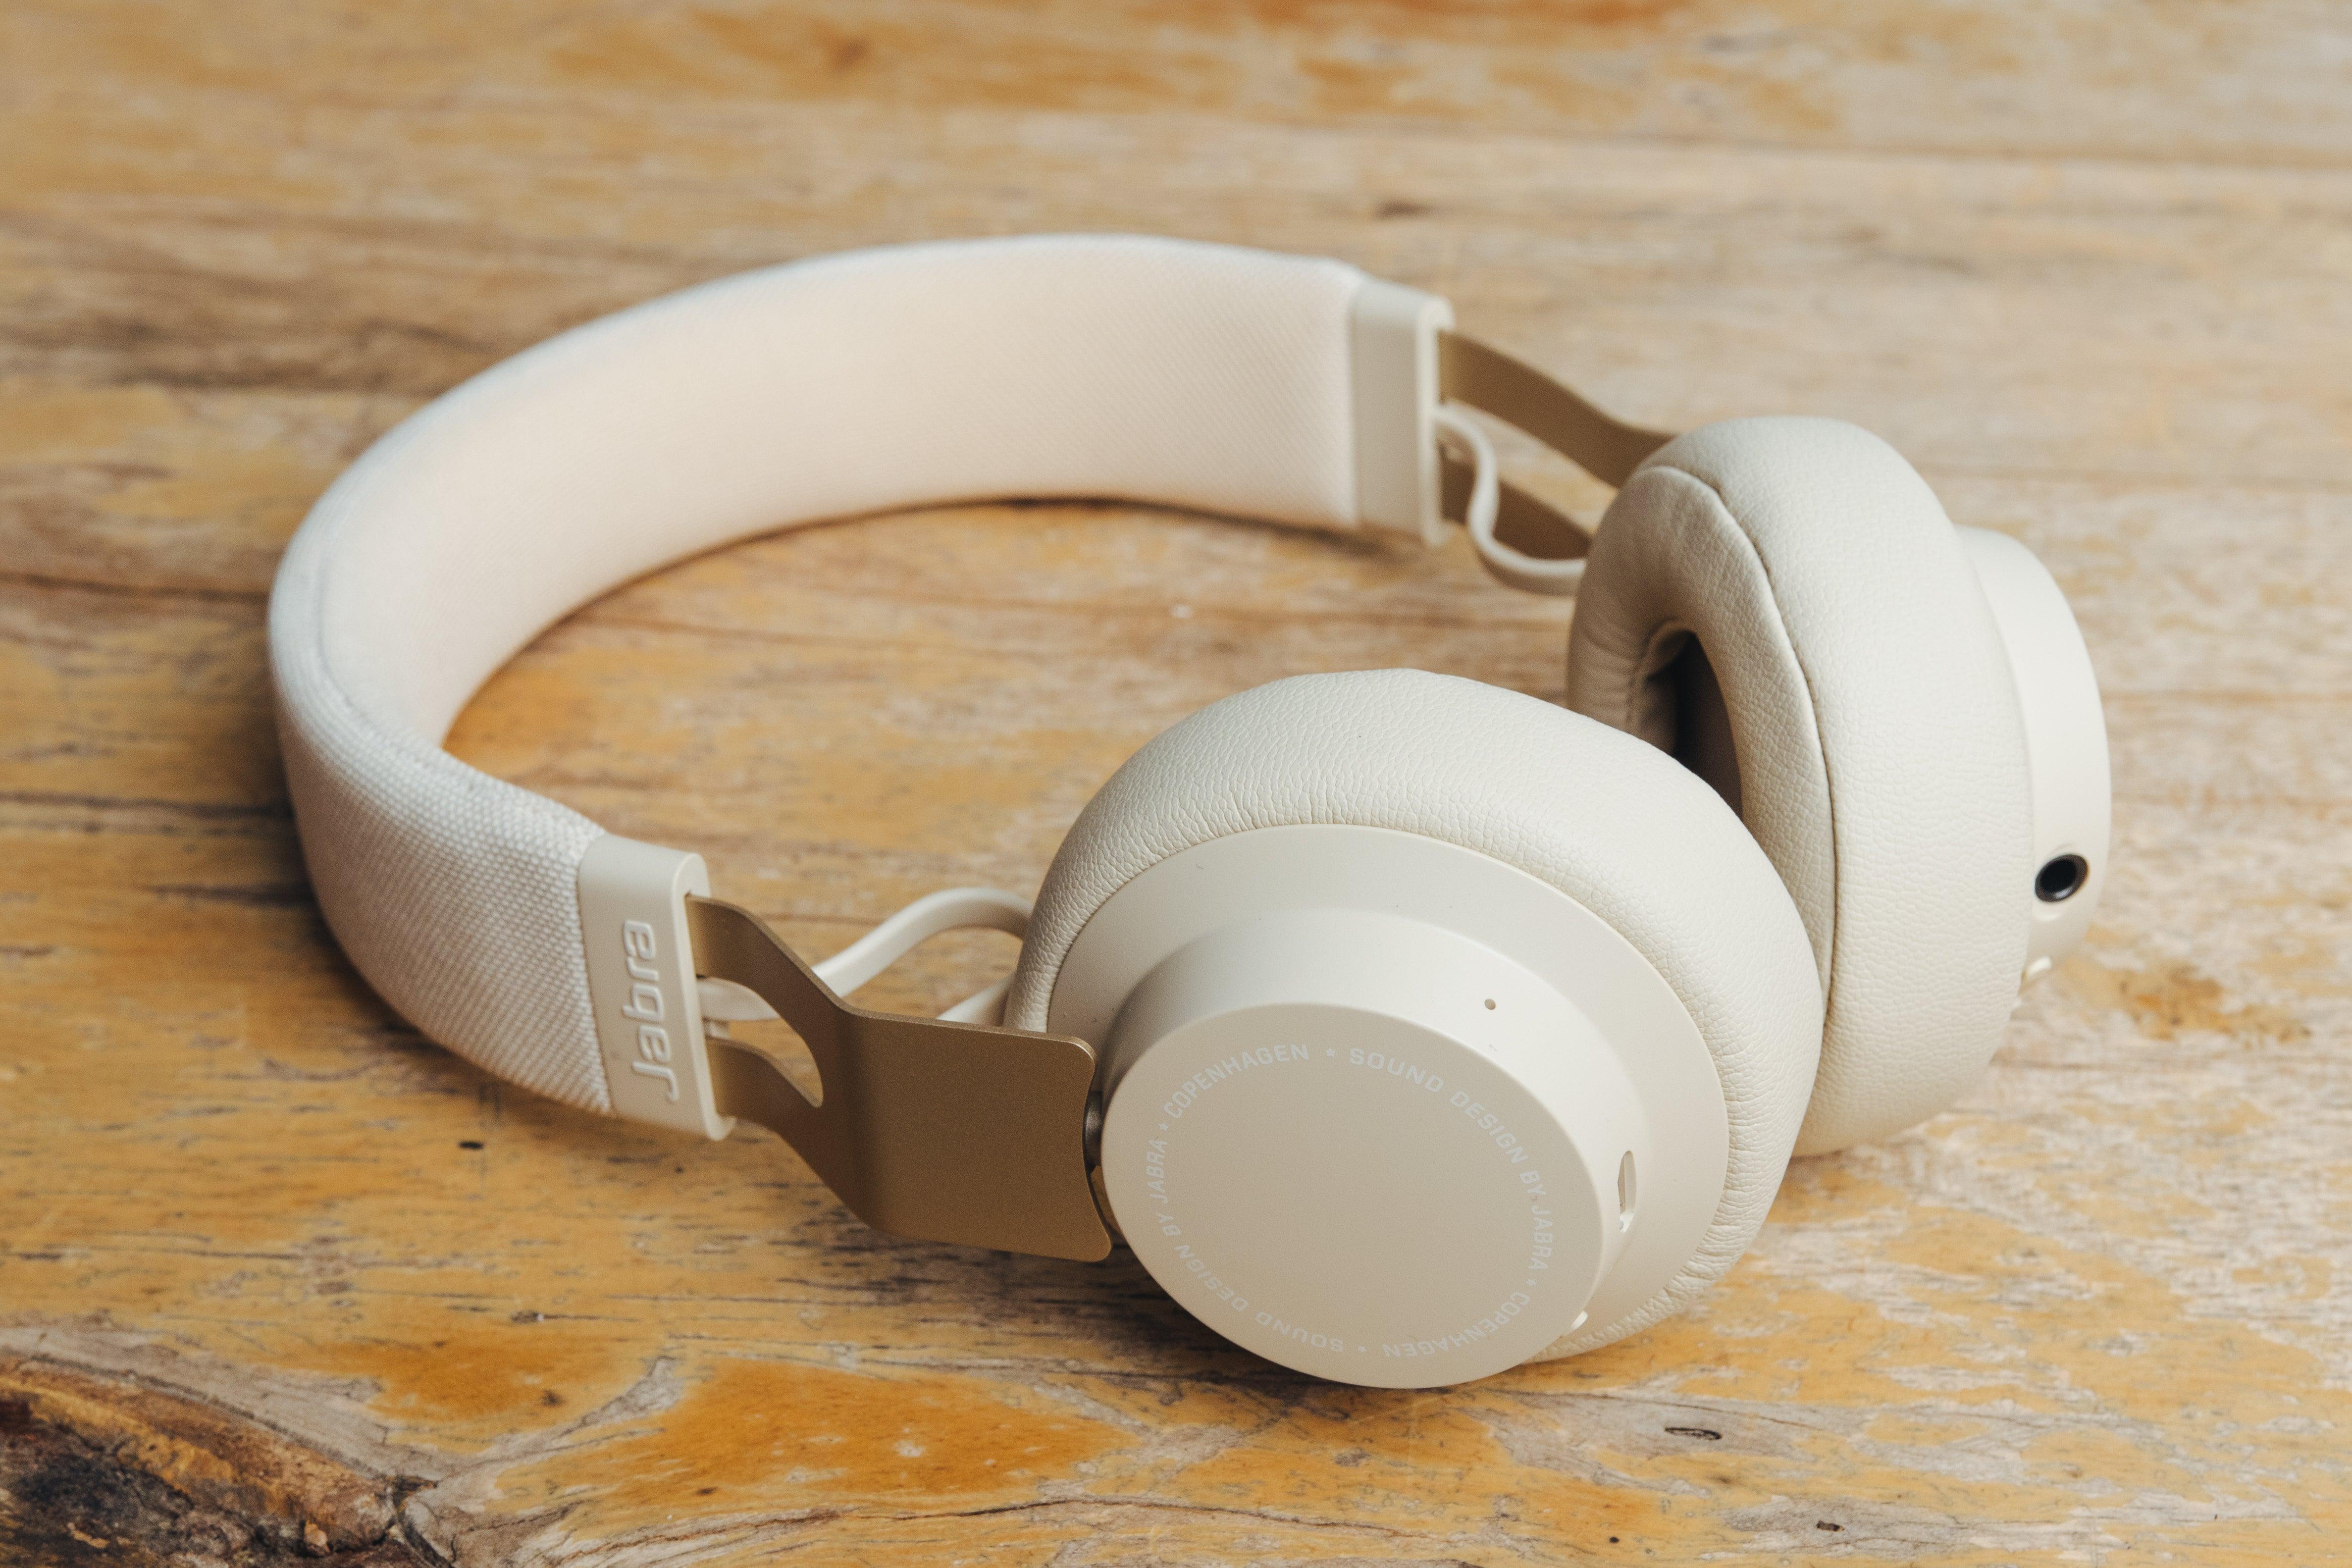 white Jabra headphones on wooden surface